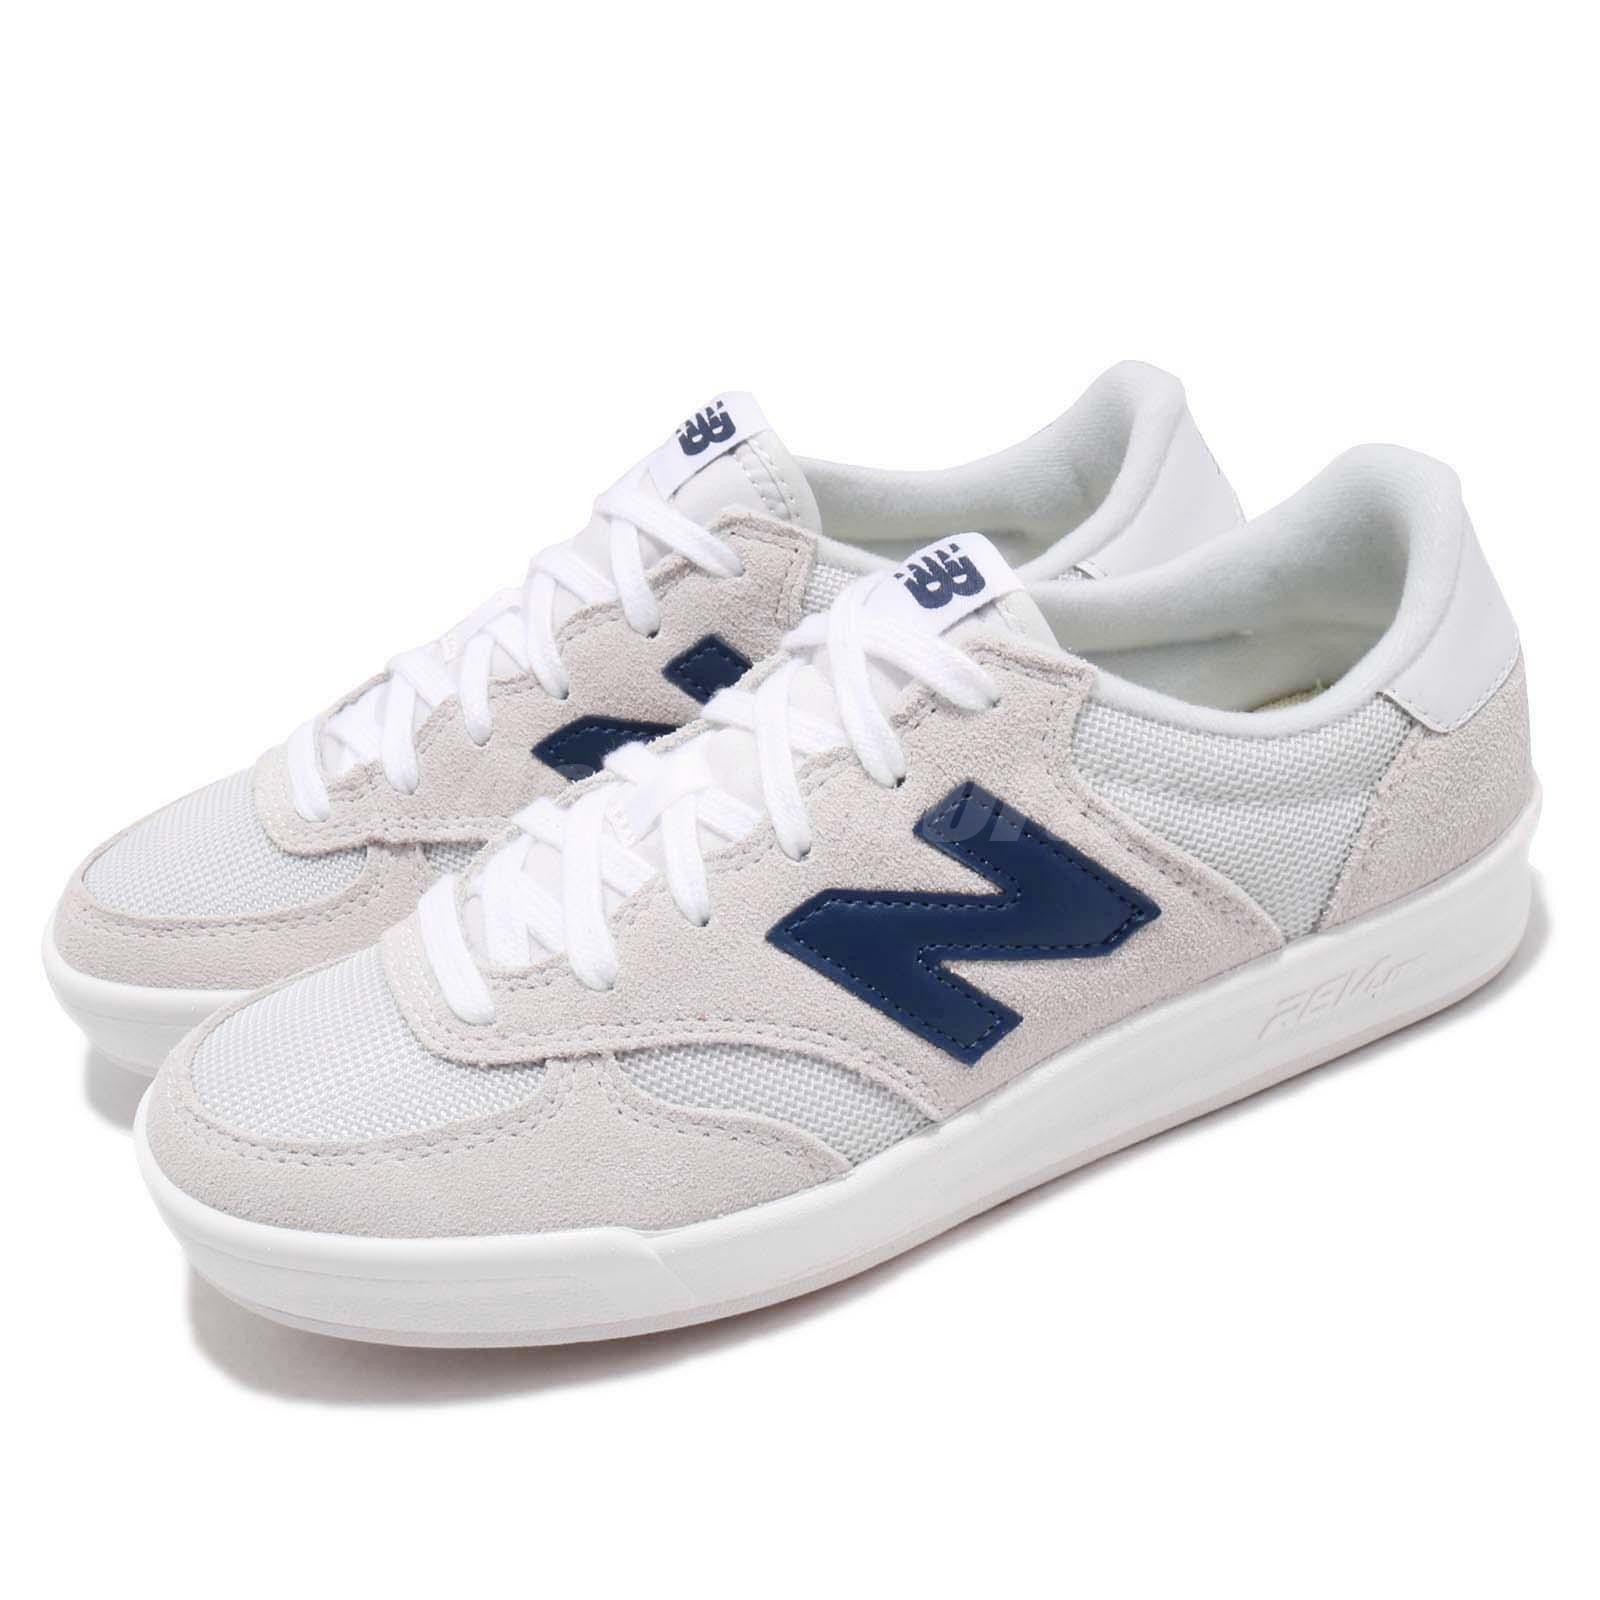 New balance WRT300WN D Ancho Ancho Ancho gris Azul Mujeres Informal Zapatos Tenis WRT300WND  echa un vistazo a los más baratos